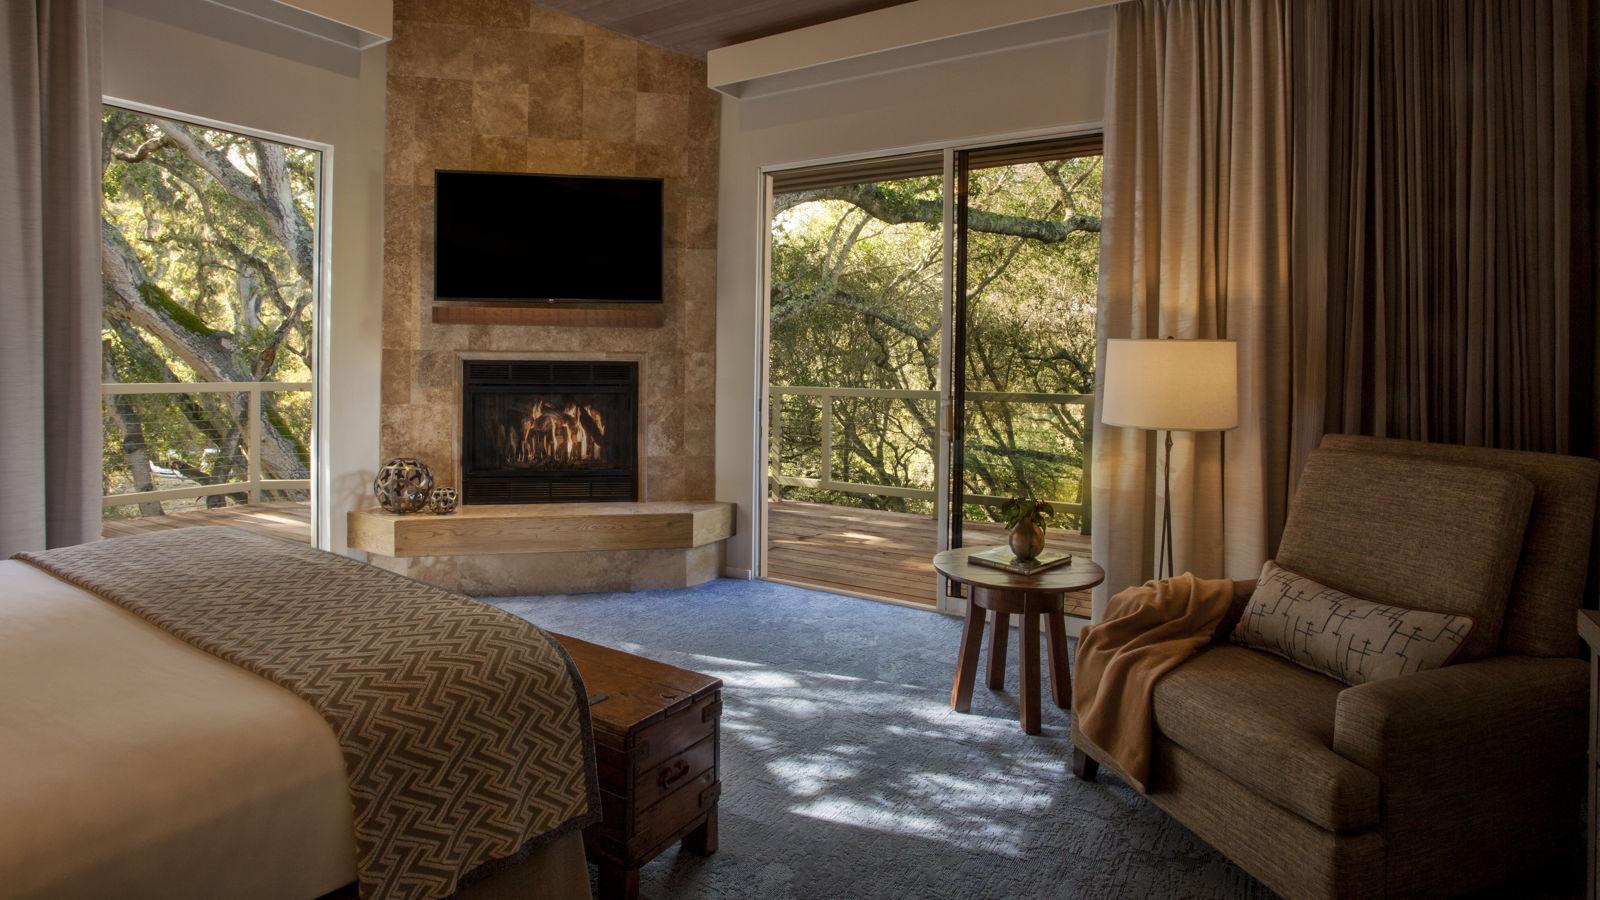 Carmel Valley Ranch_Accommodations_Suite_Garland_Bedroom_Master_6339_BM